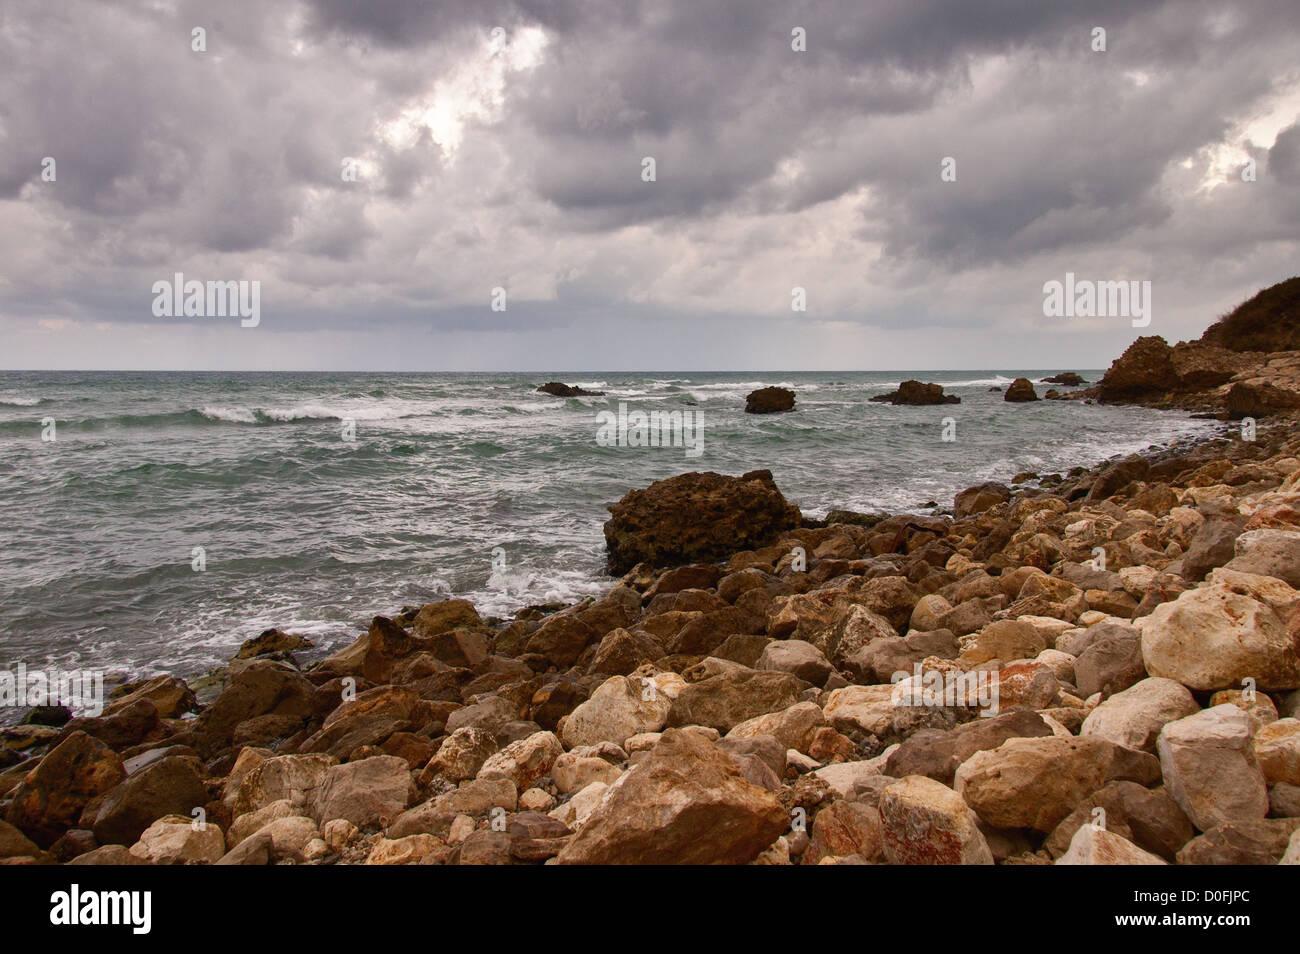 rocky coastline on a rainy day Stock Photo